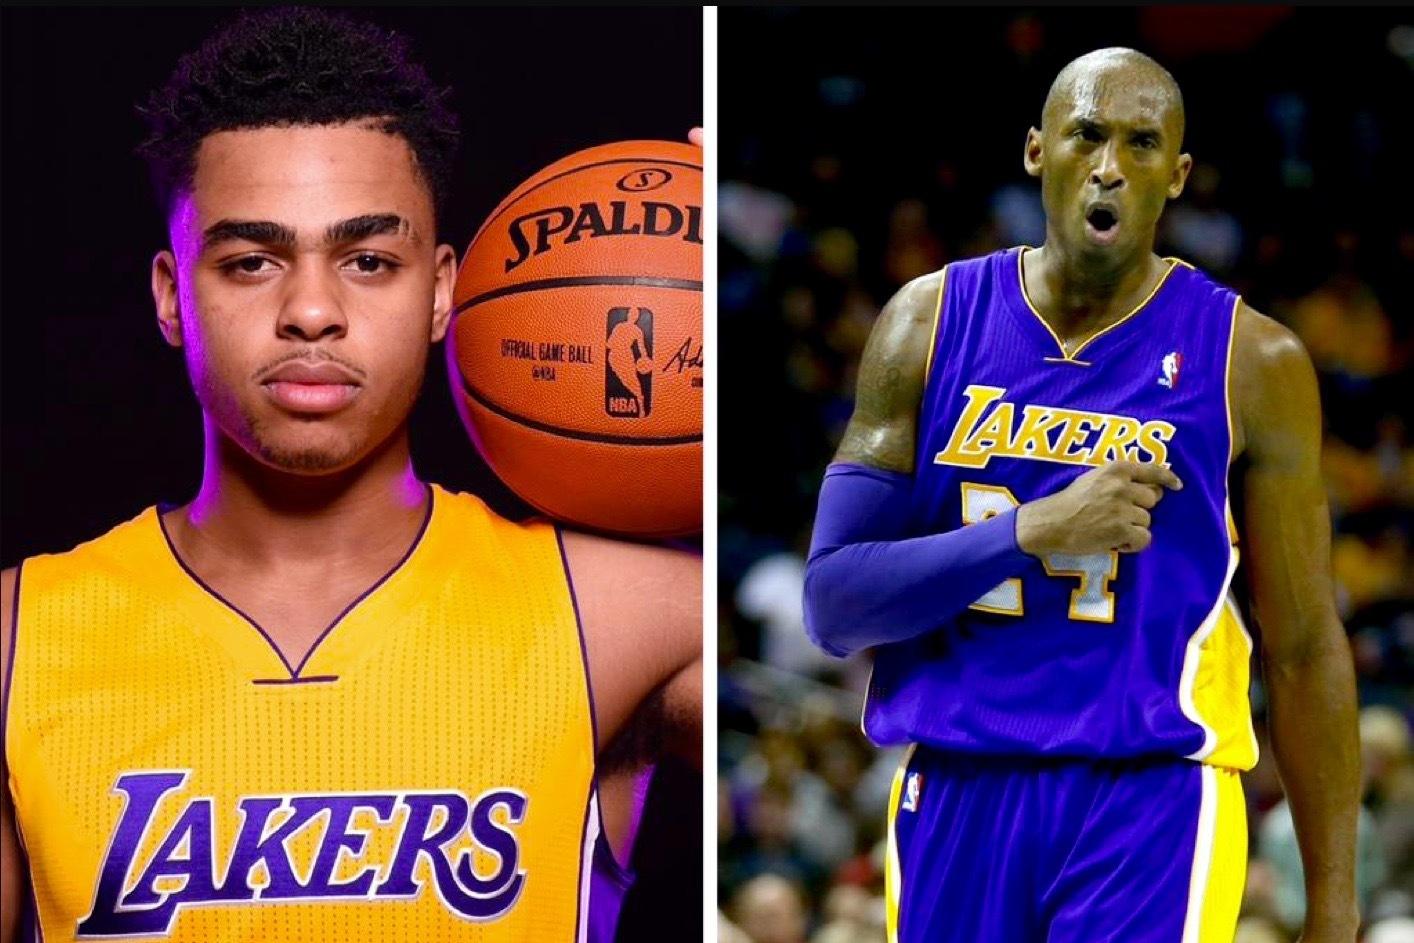 a02b5b51143688 Lakers Rookie D Angelo Russell Calls Kobe Bryant  His Michael Jordan   Bleacher Report Los Angeles Lakers rookie D Angelo Russell was born in  1996—or in ...